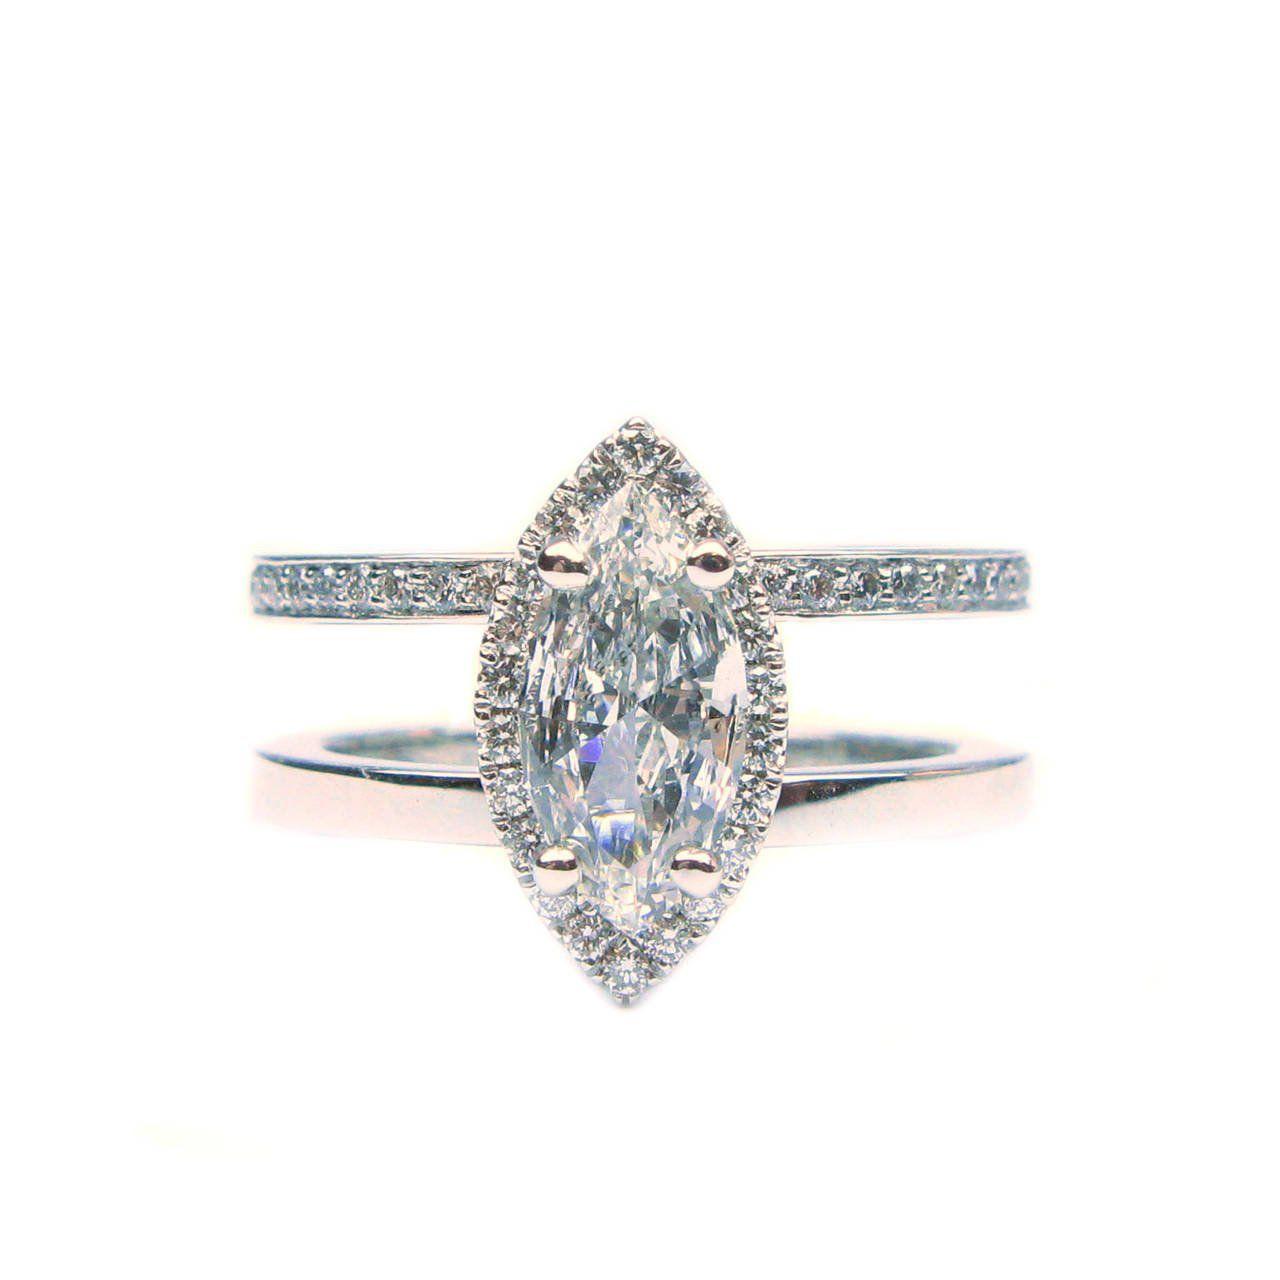 J. Birnbach 1.15 Carat Total Marquise Diamond Frame Ring